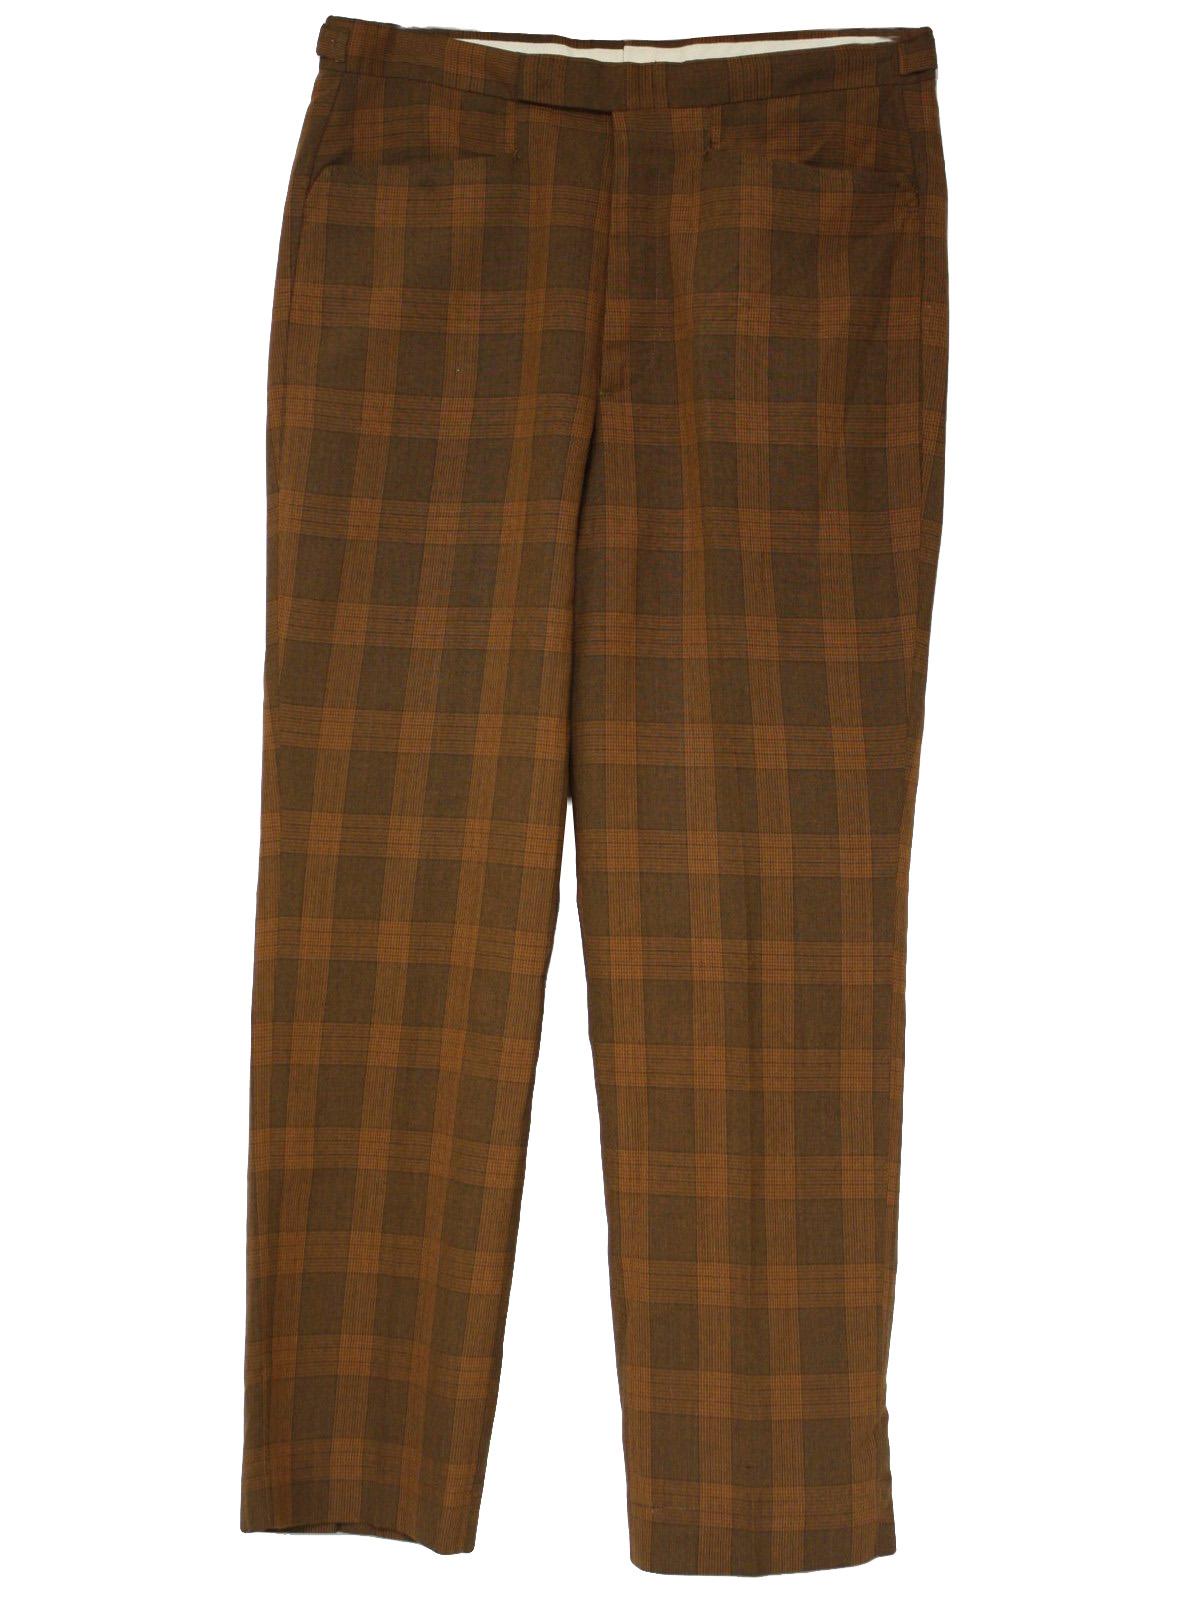 8b1d6be2 1960's Farah Mens Mod Plaid Pants